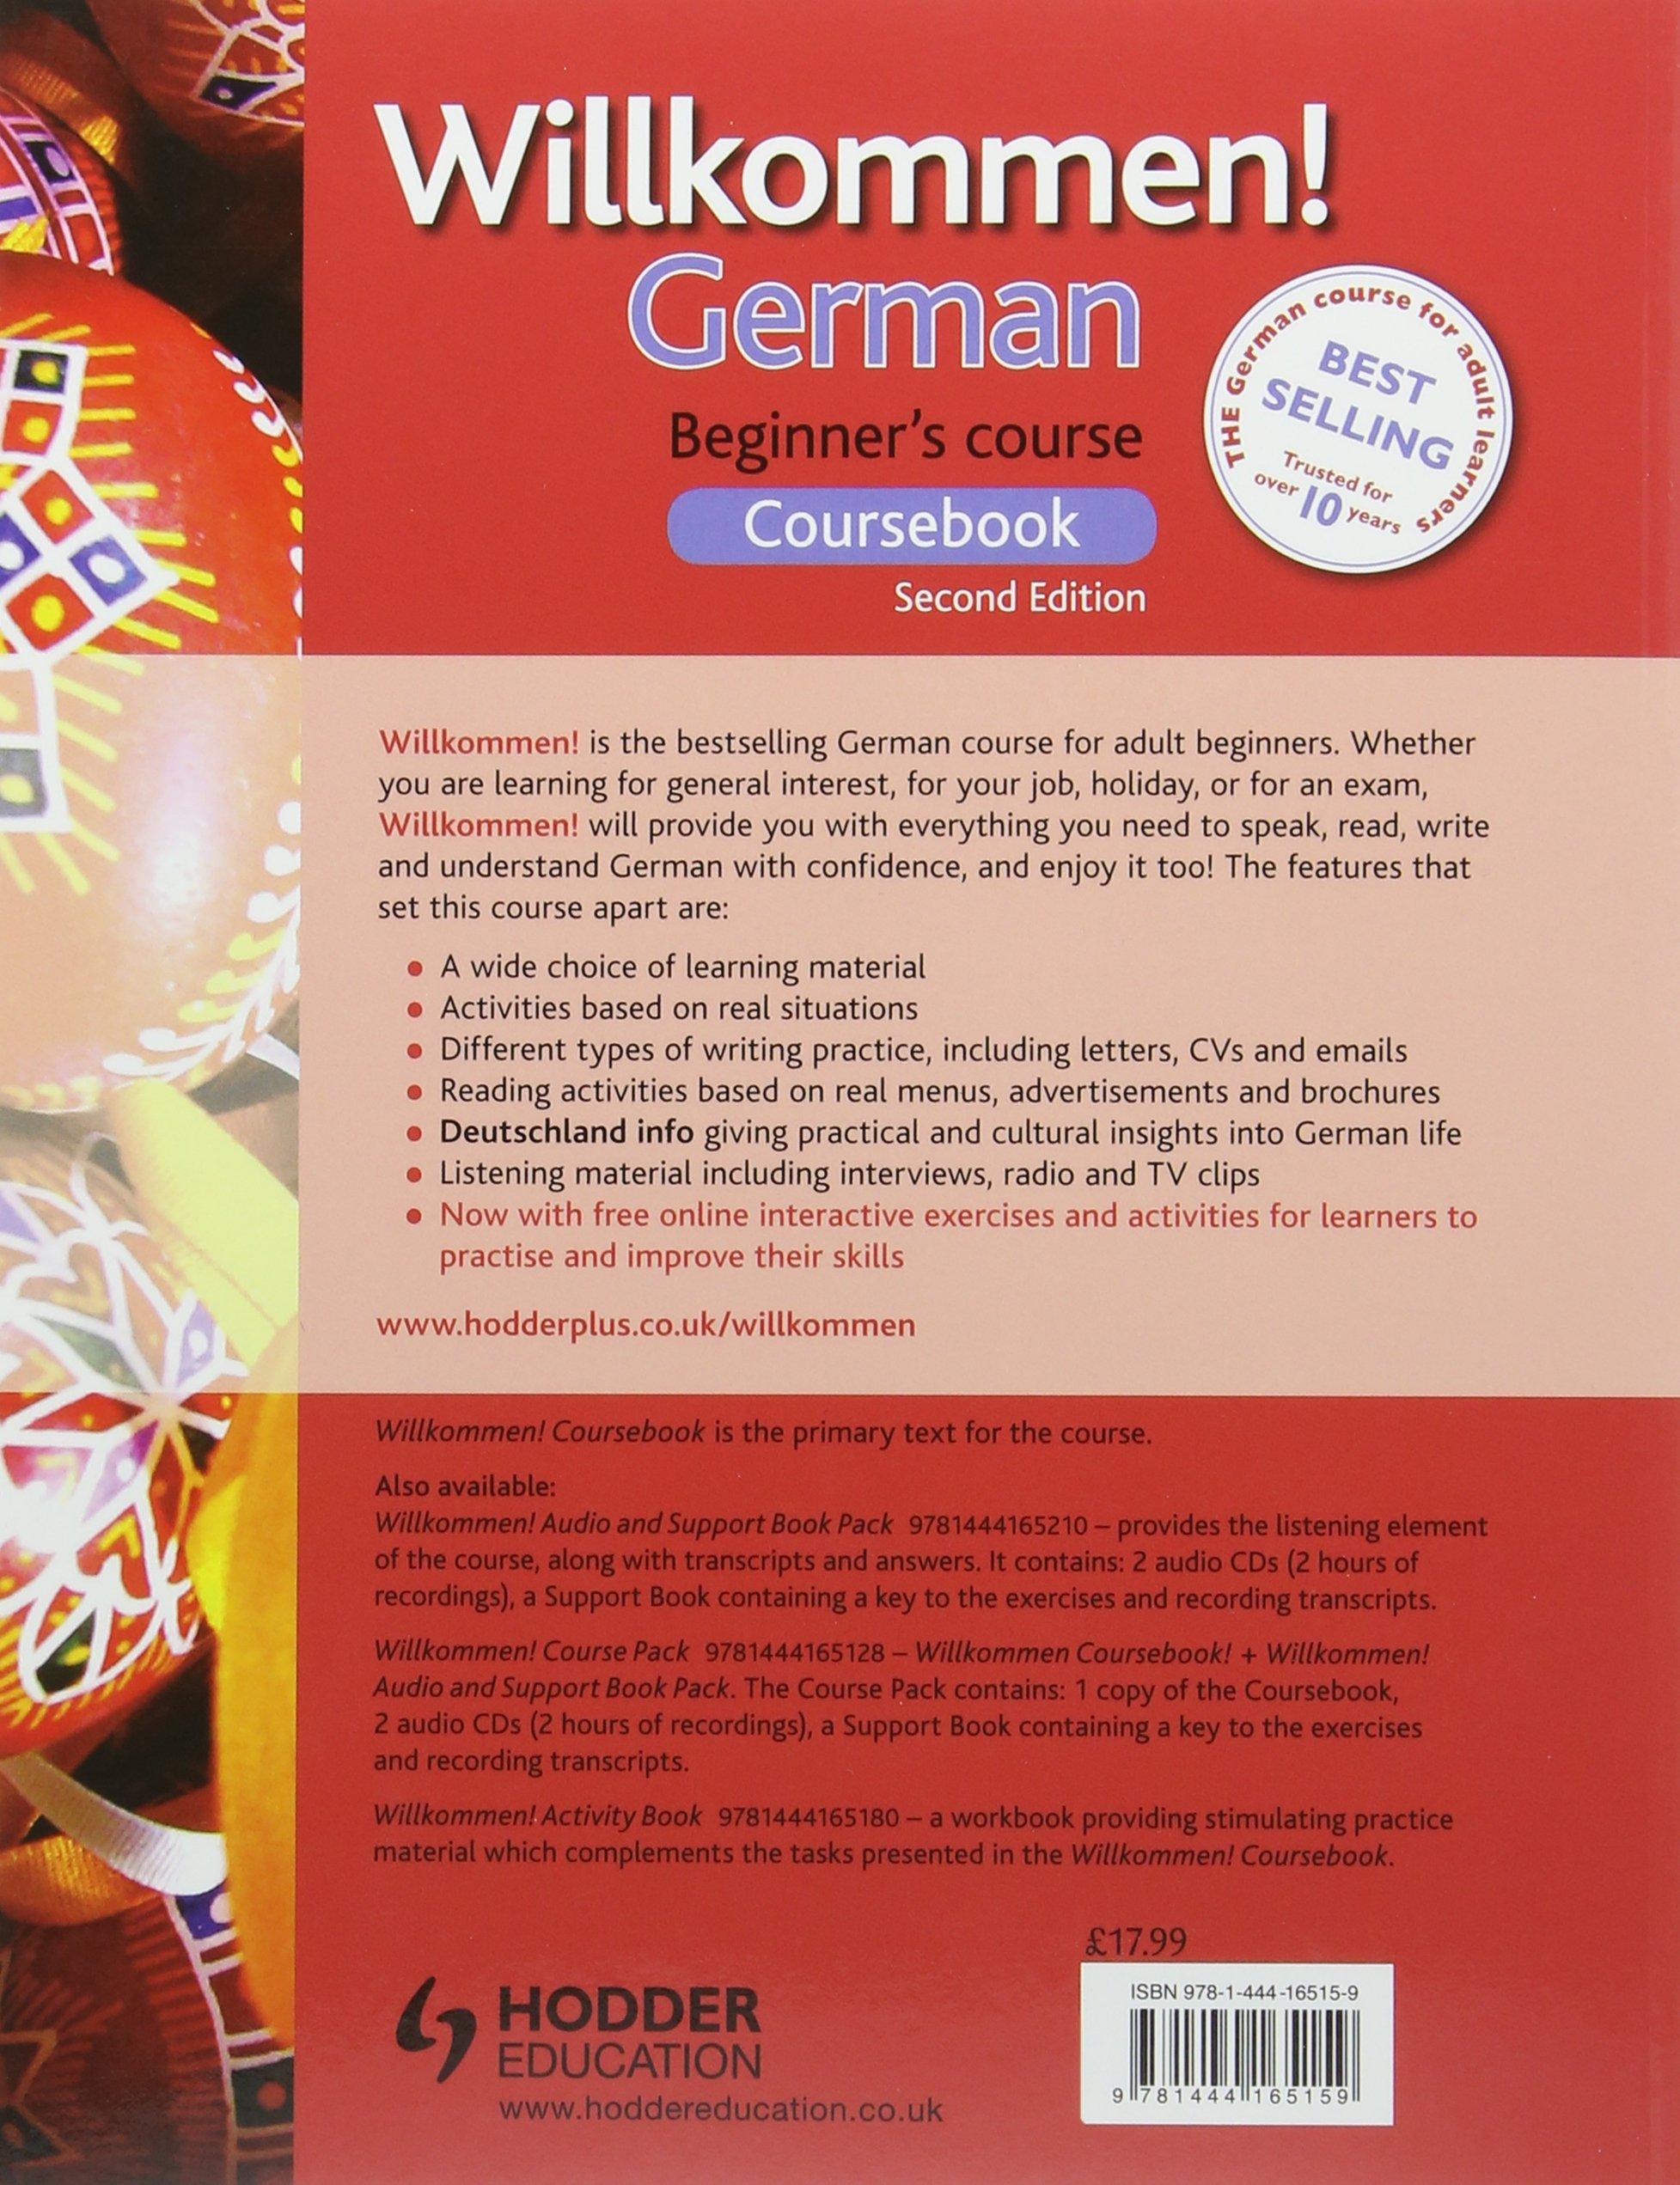 Willkommen! German Beginner's Course 2ED Revised: Coursebook: Amazon.co.uk:  Paul Coggle, Heiner Schenke: 9781444165159: Books